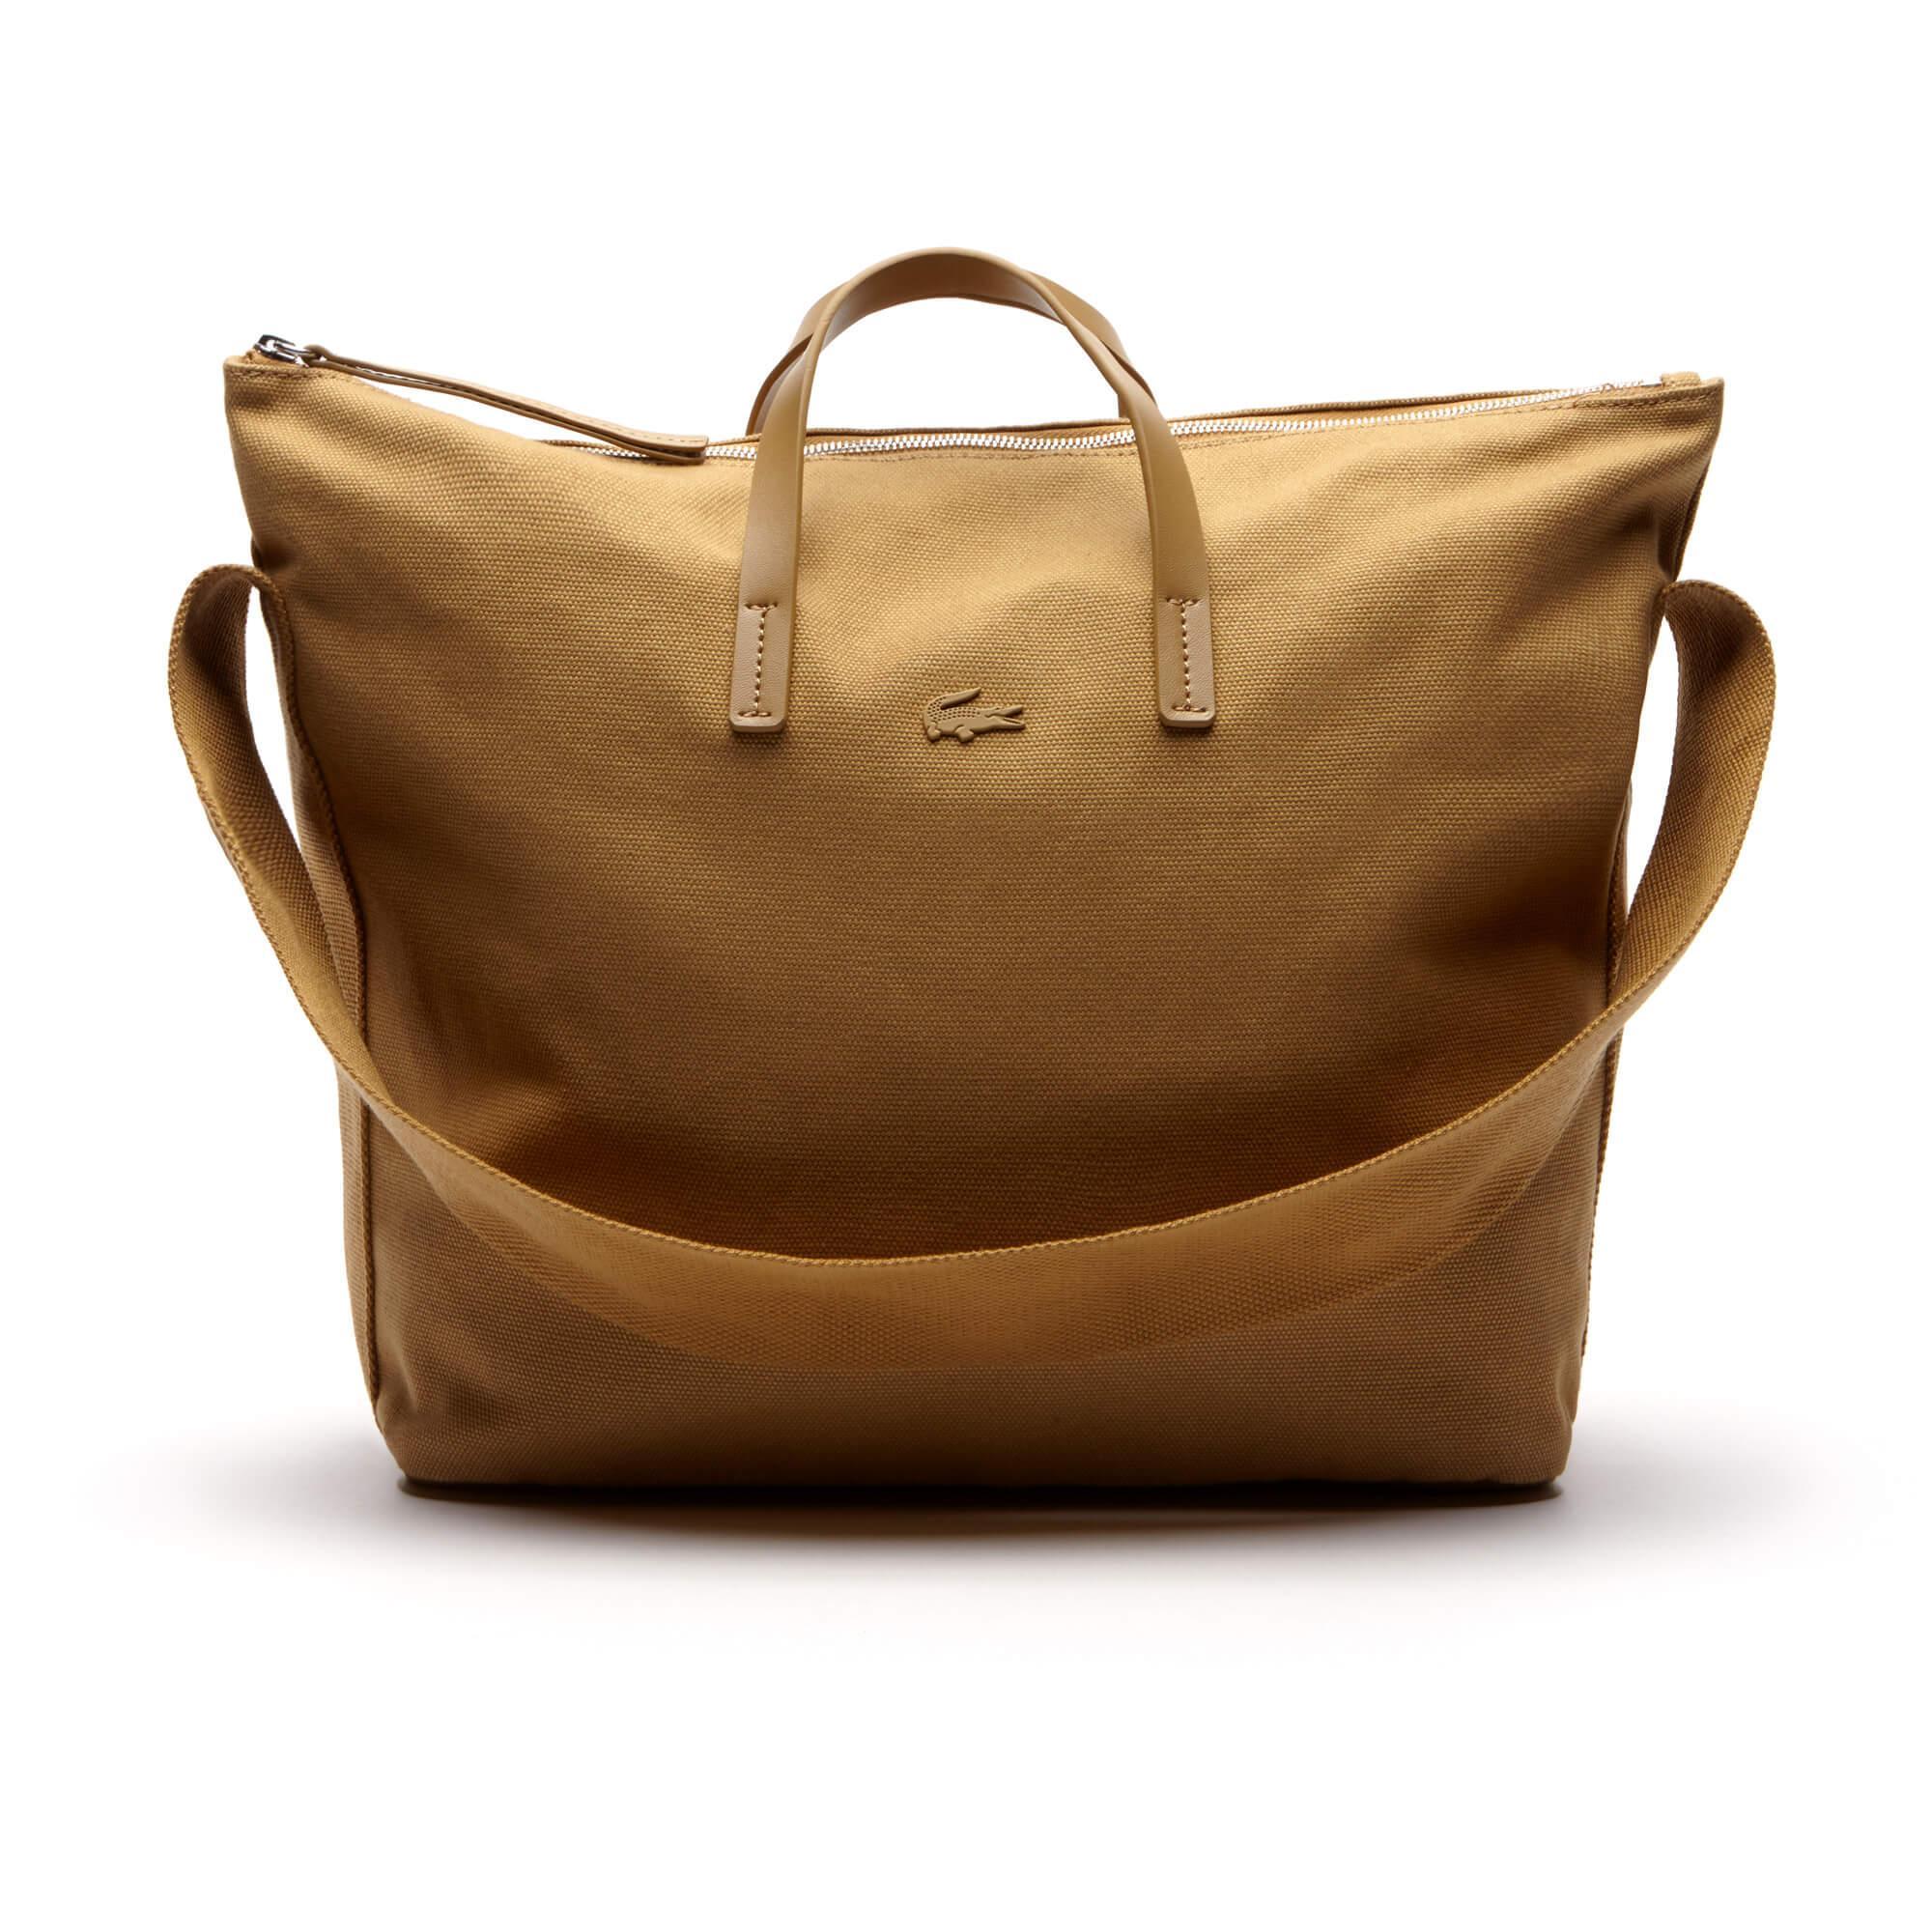 Lacoste Kadın Suzie Kahverengi Çanta